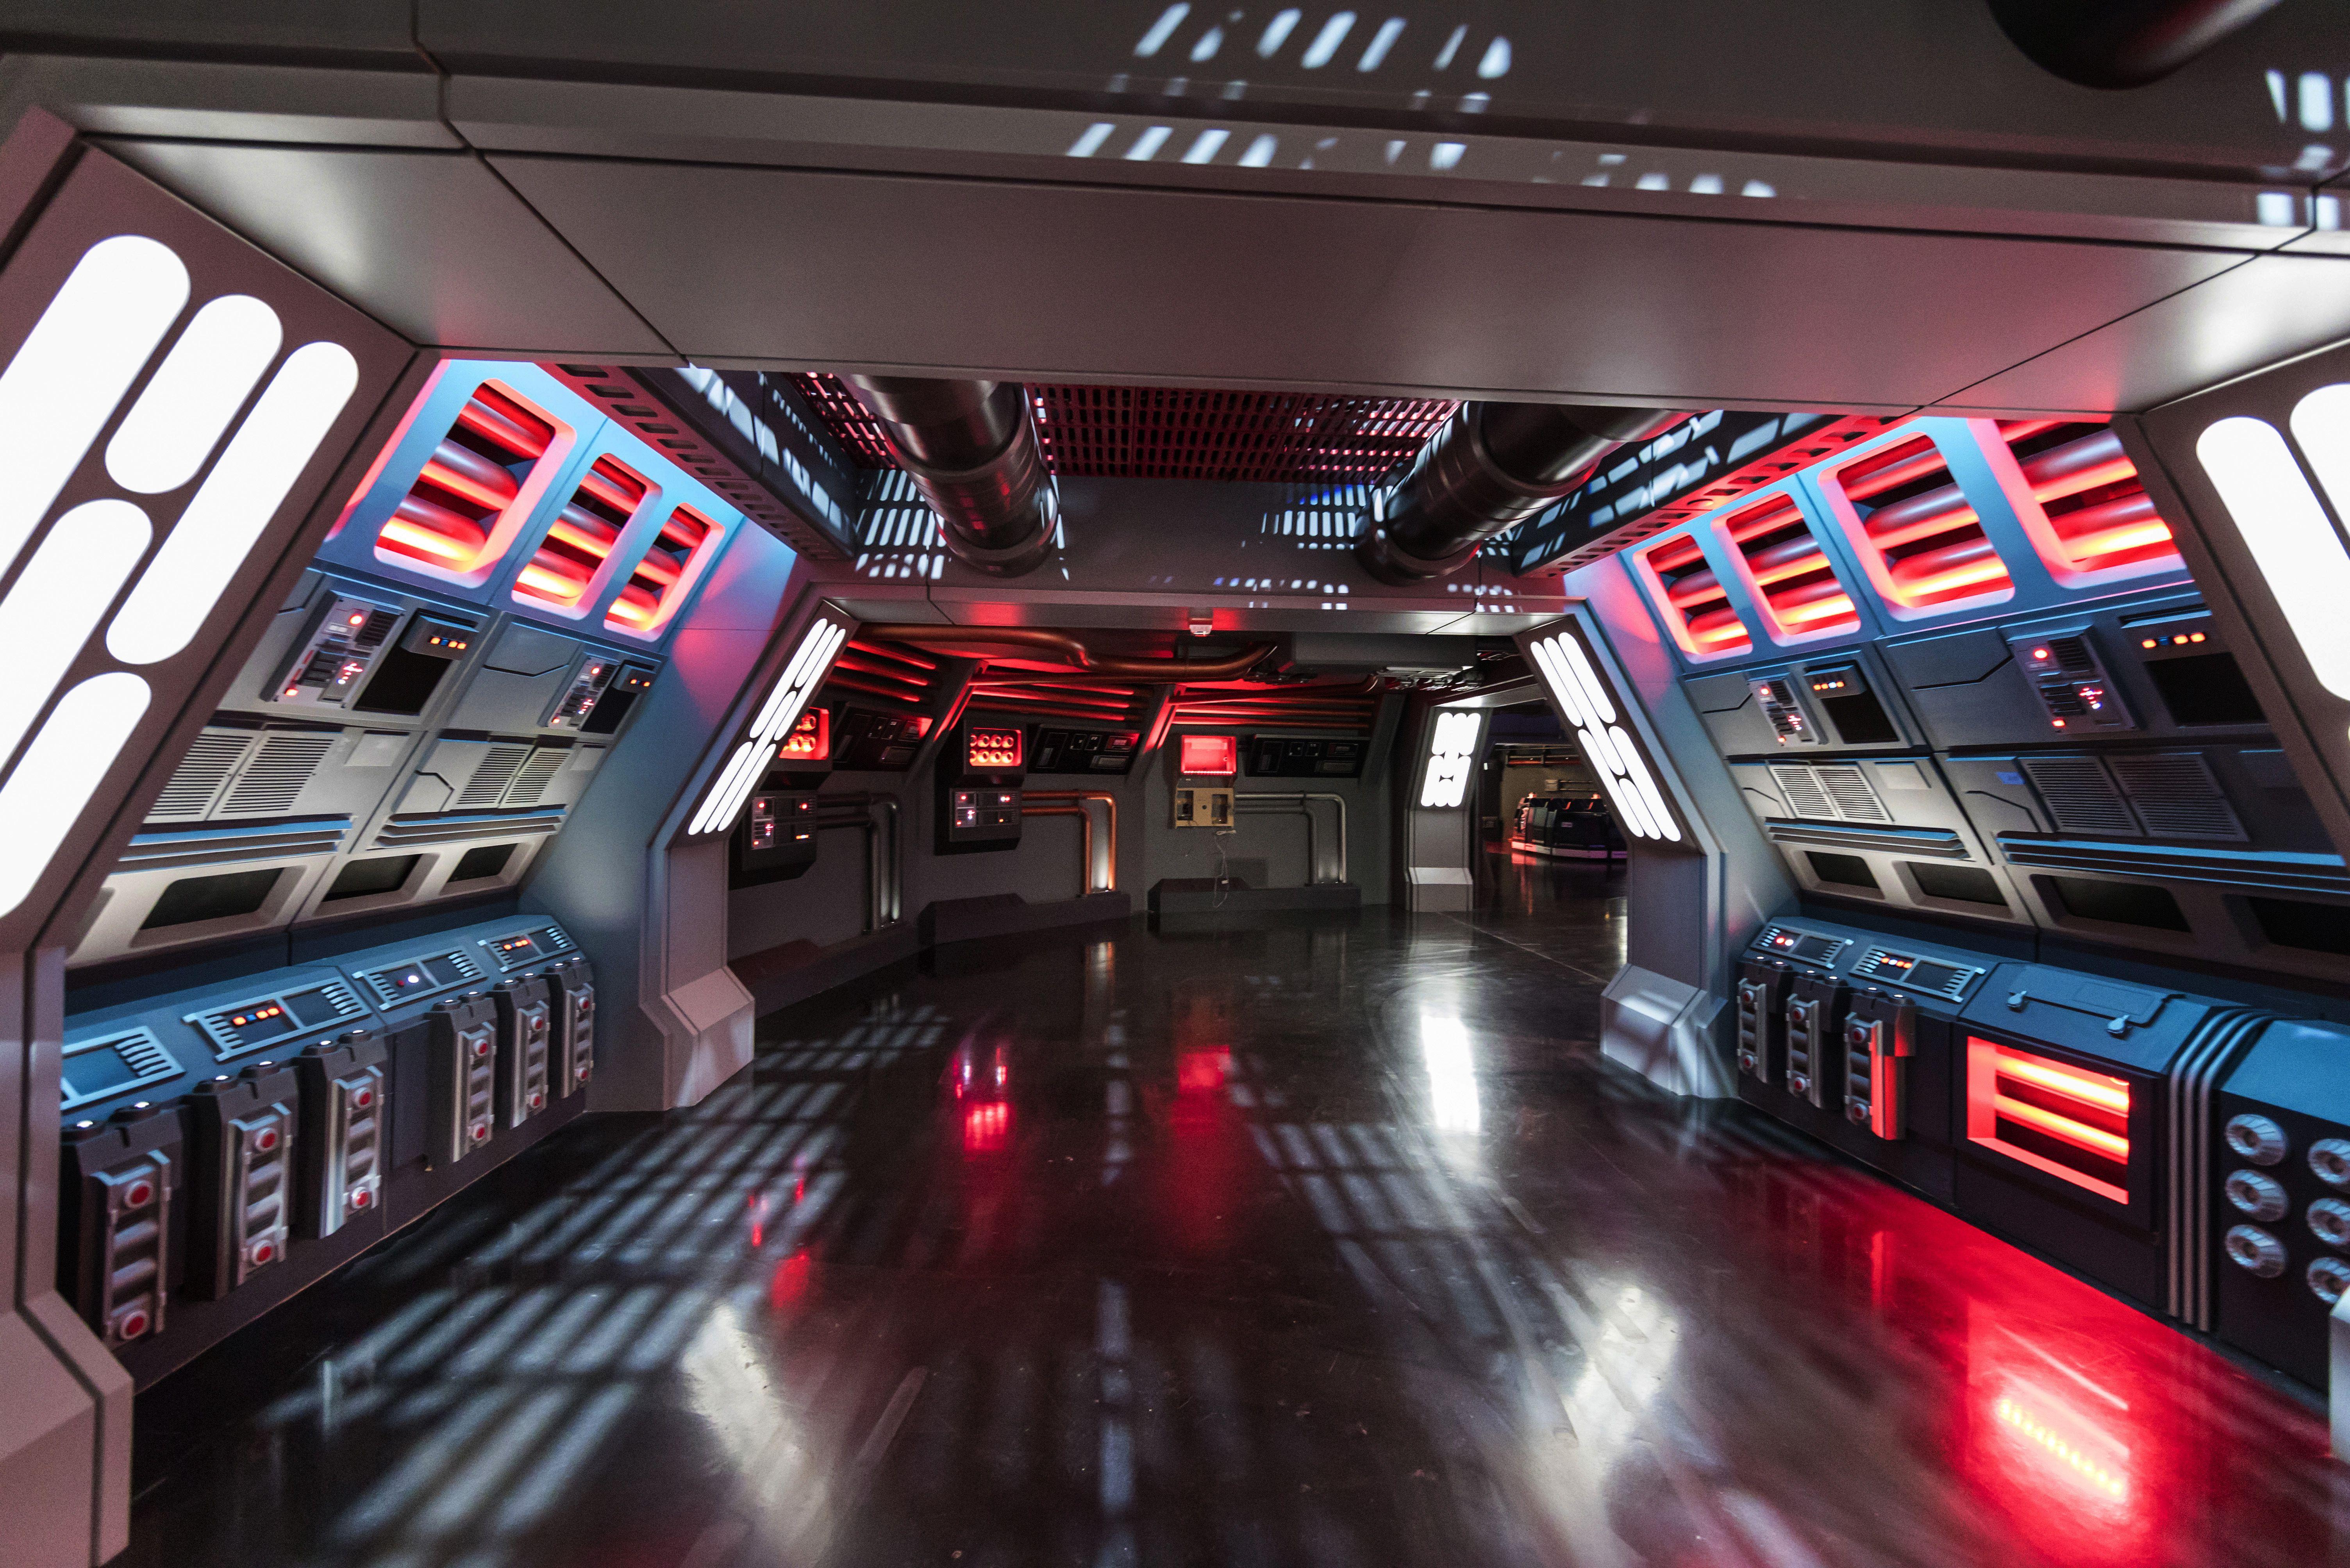 Star Wars: Rise of the Resistance ride en los parques de Disney